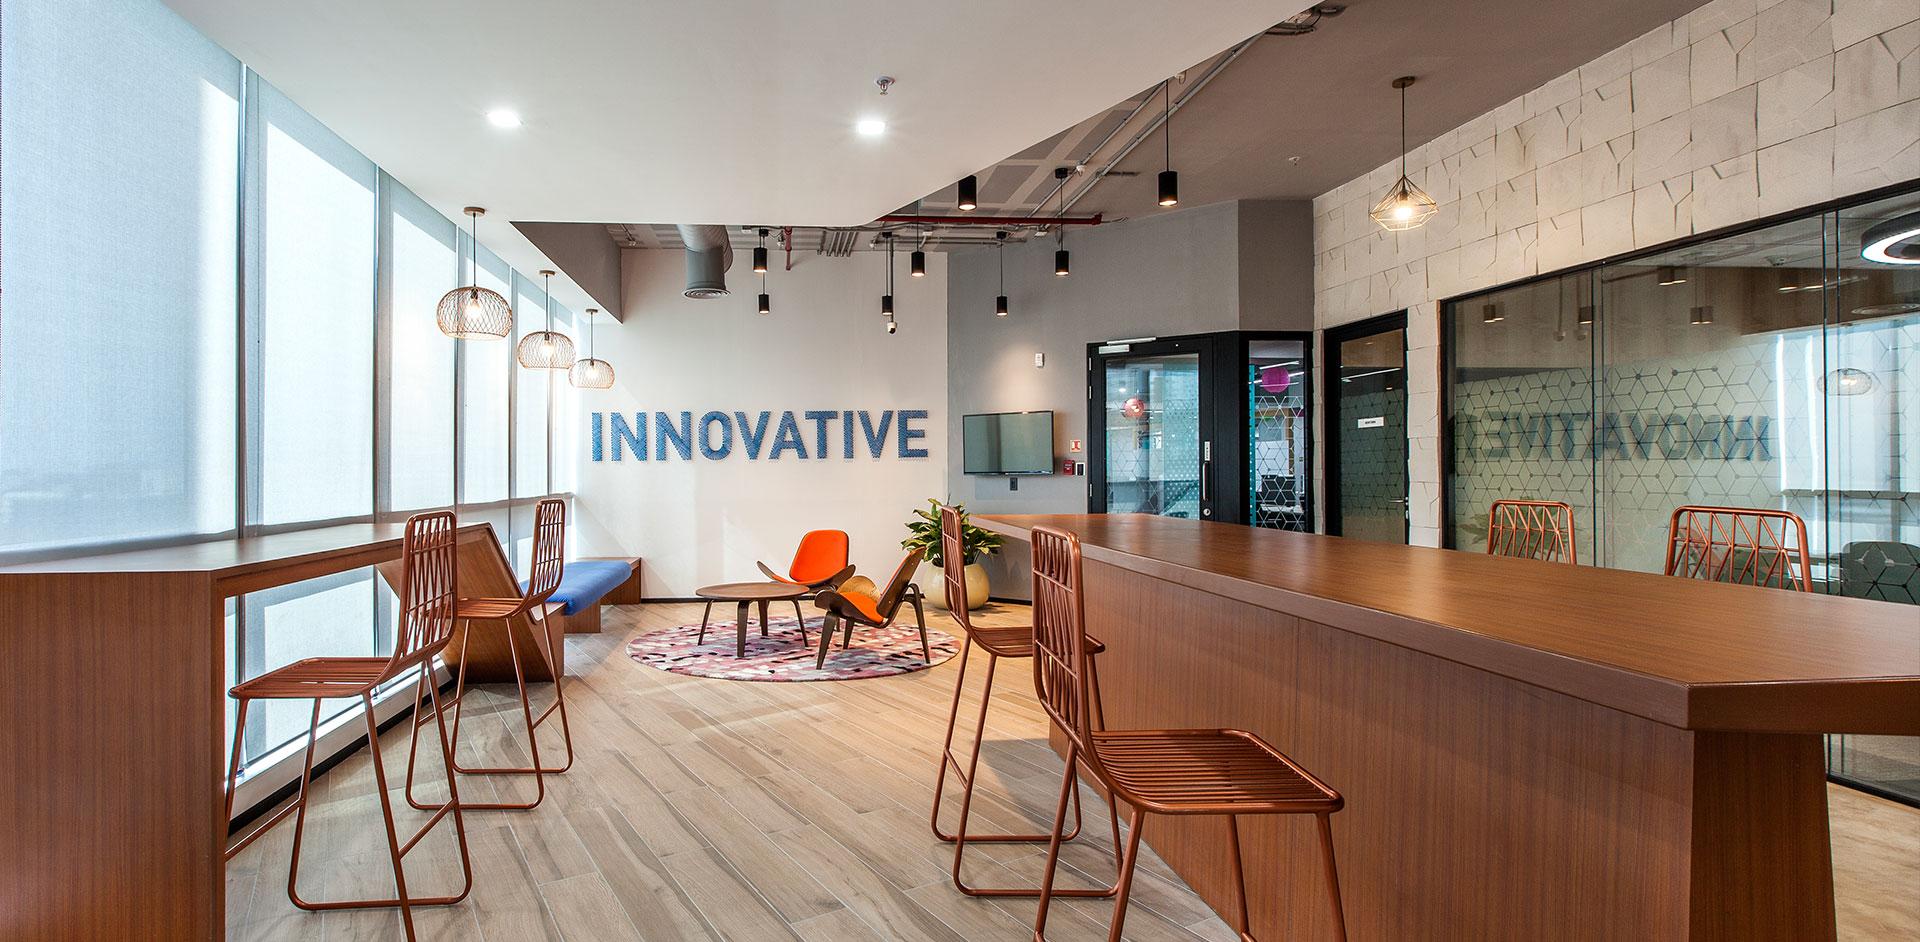 Space Matrix - Leading Workplace & Corporate Office Interior Design ...